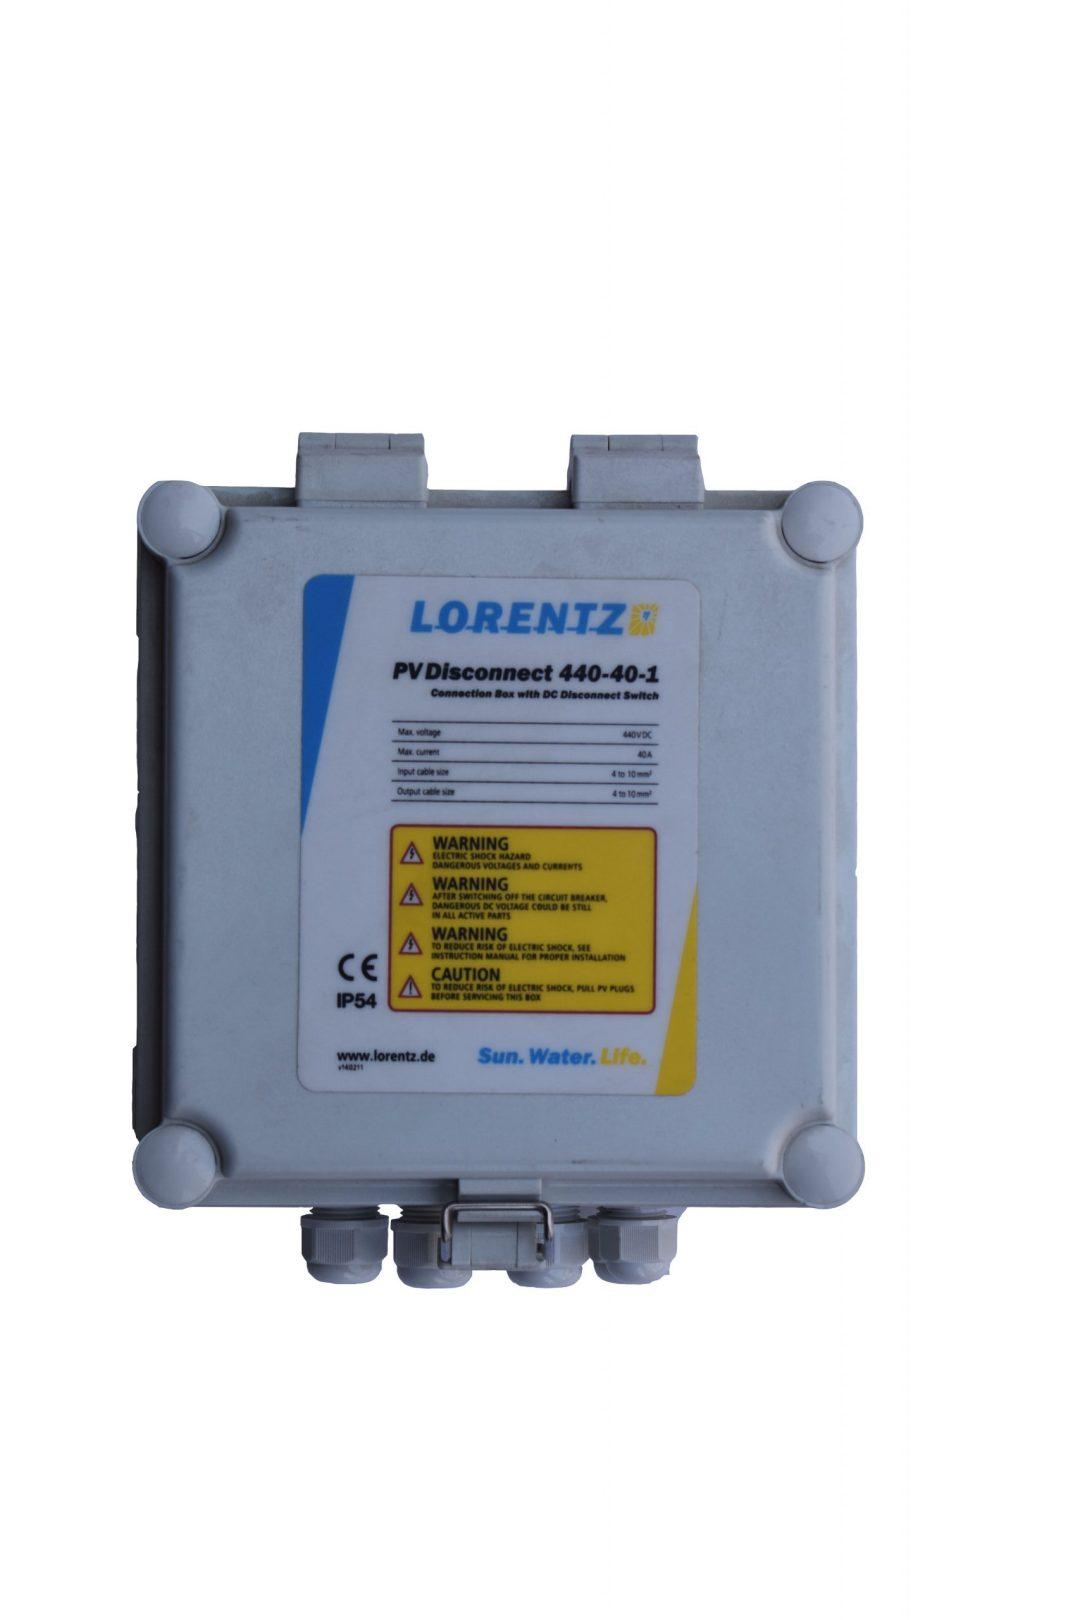 Lorentz pv disconnect